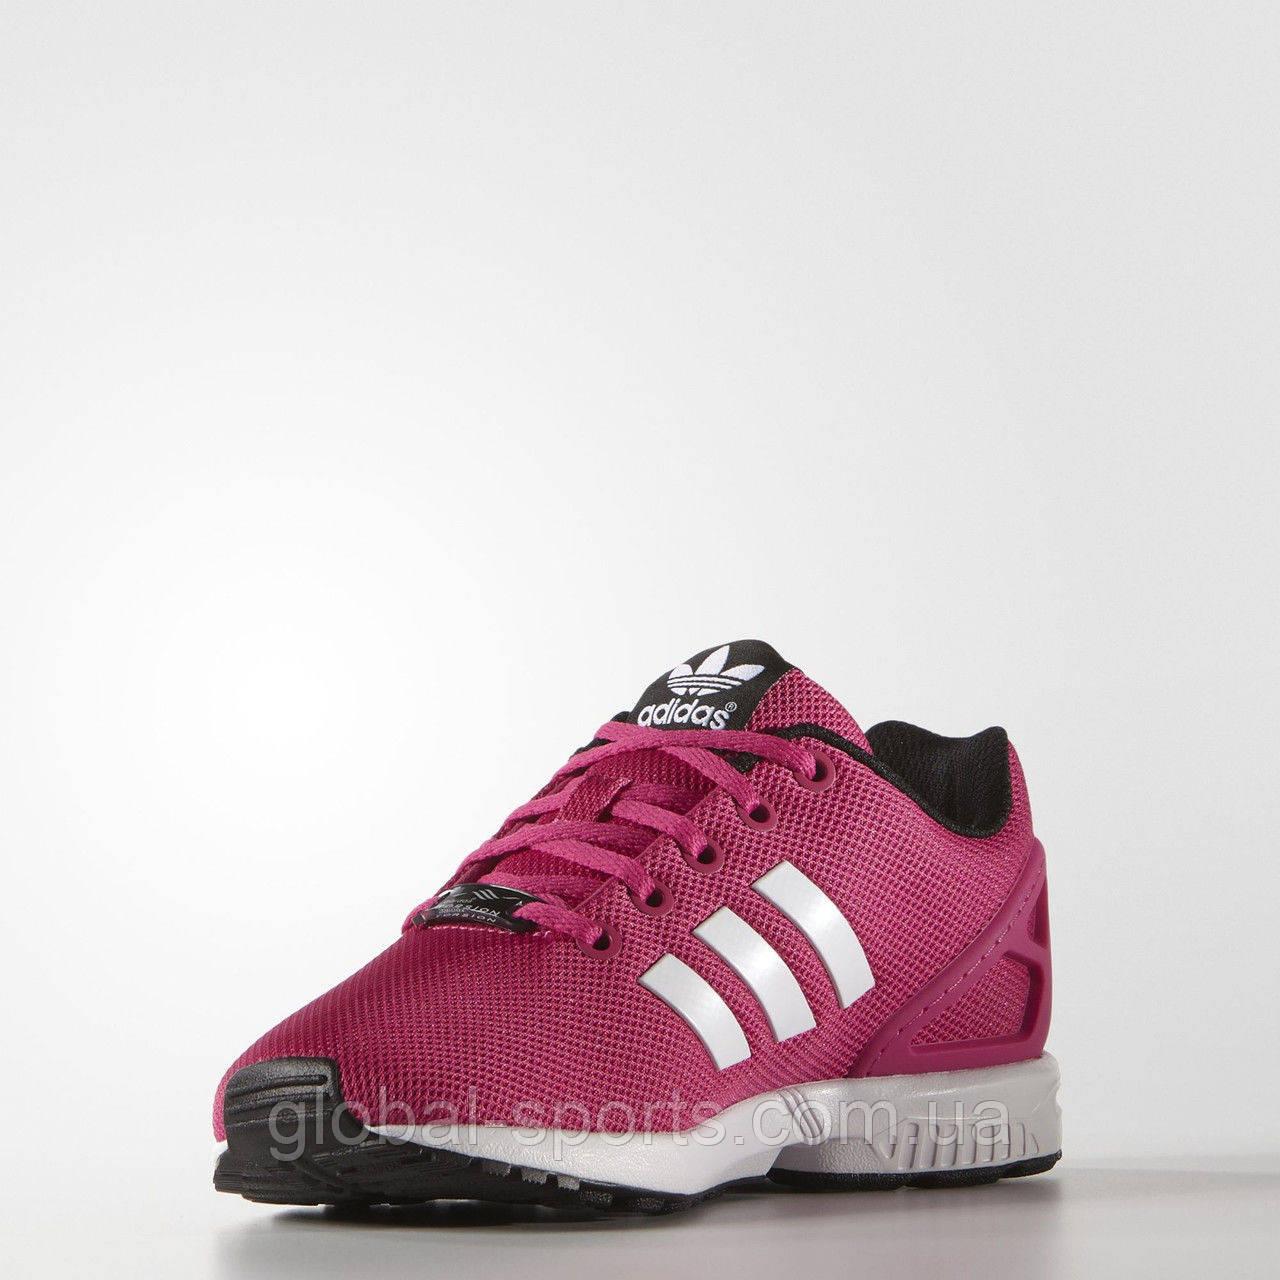 2dc22fe8 Детские кроссовки adidas zx flux (Артикул: S74952): продажа, цена в ...